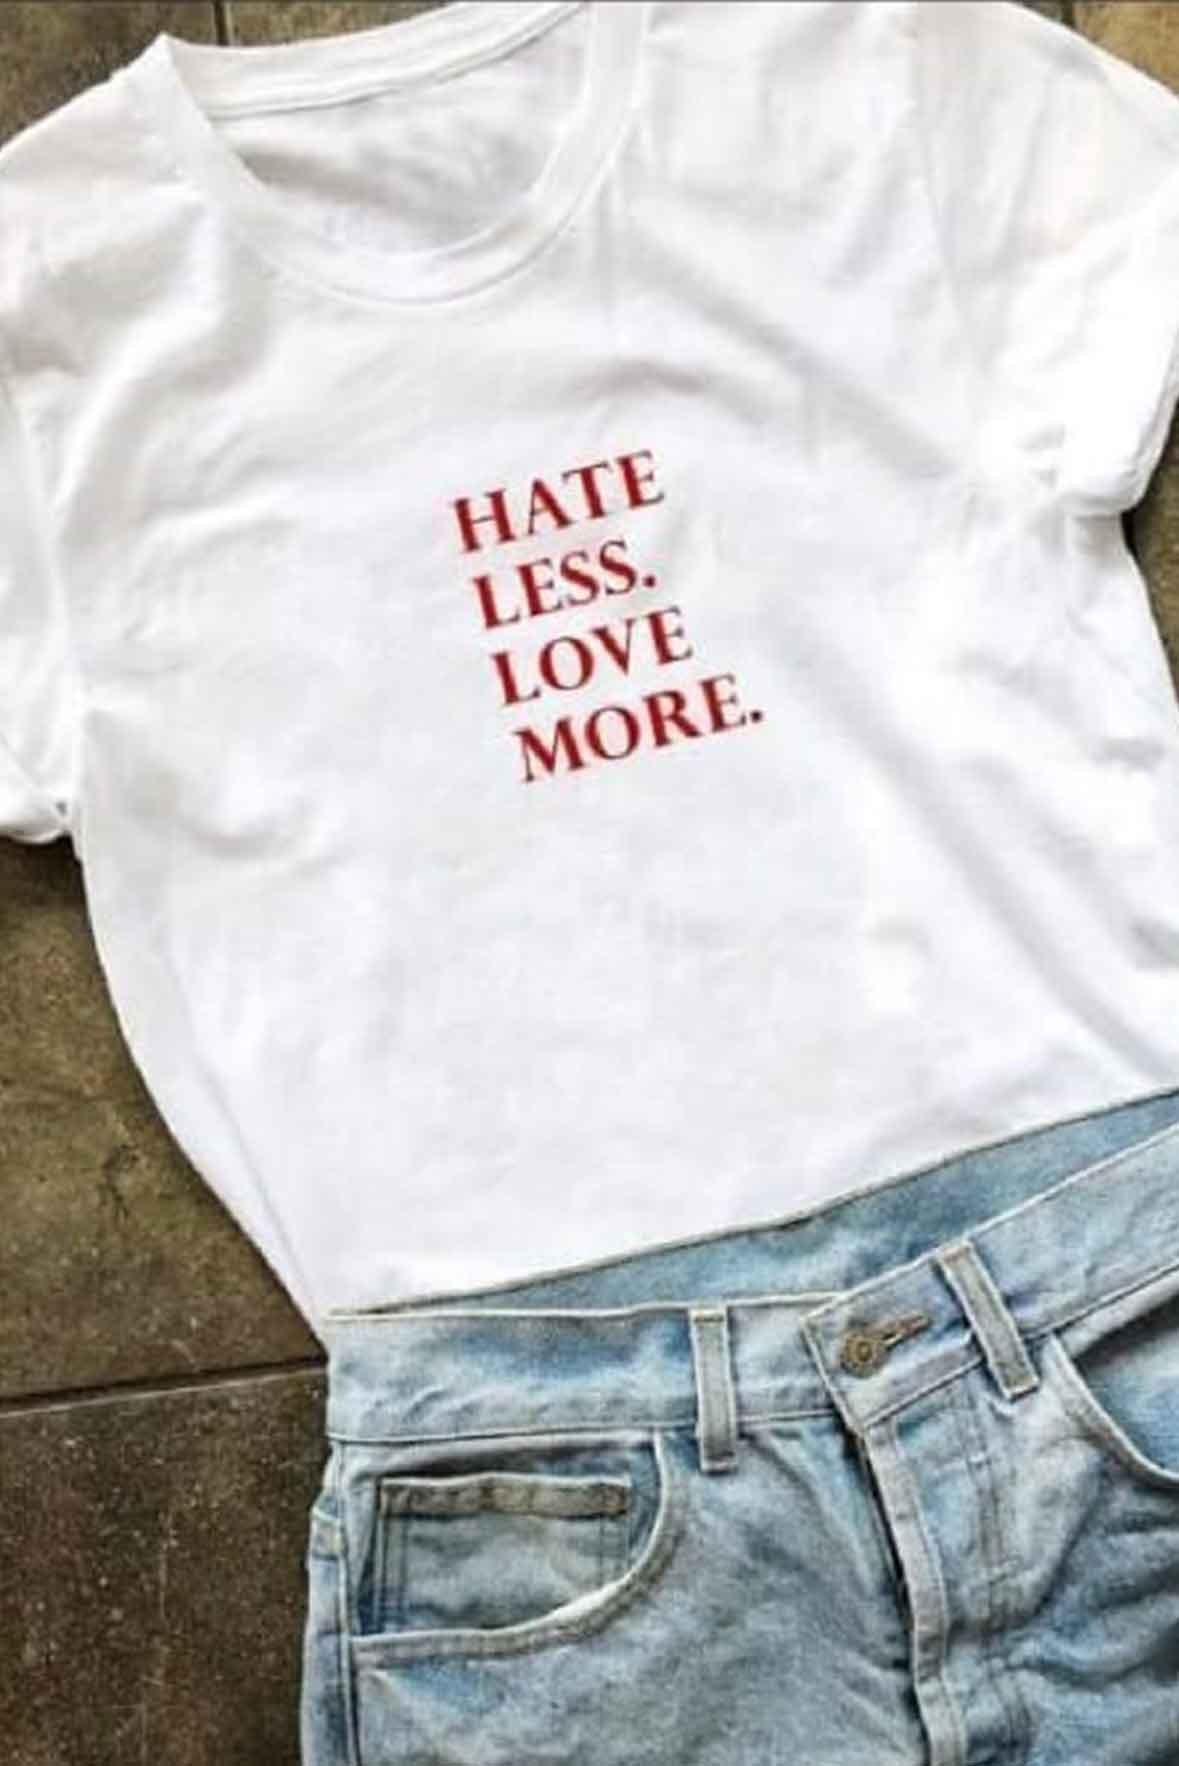 Hate less t-shirt